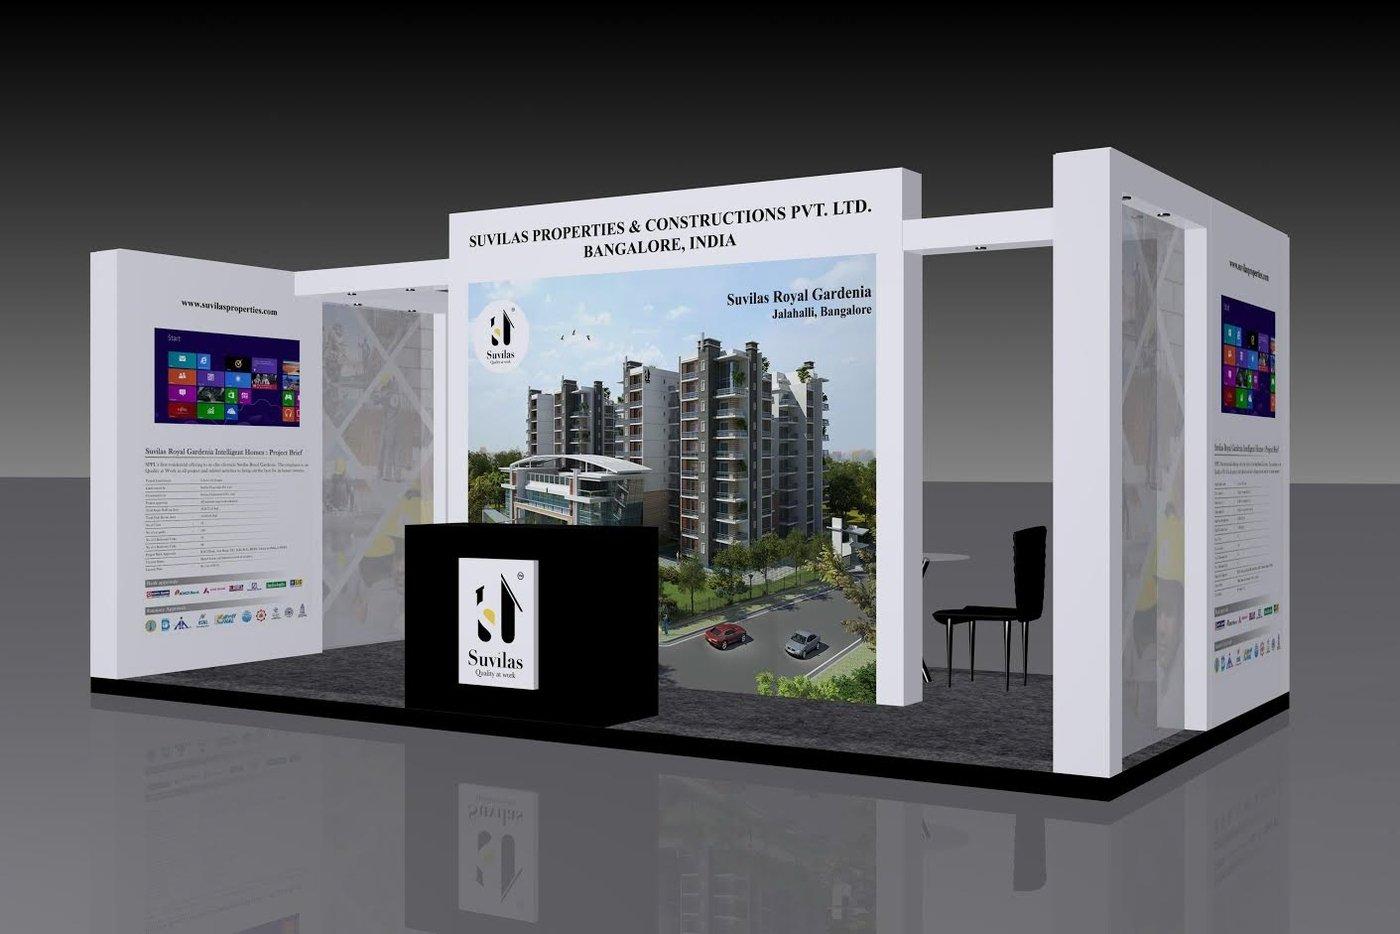 Exhibition Stall Designer Job : Exhibition stall designs by prashanth ap at coroflot